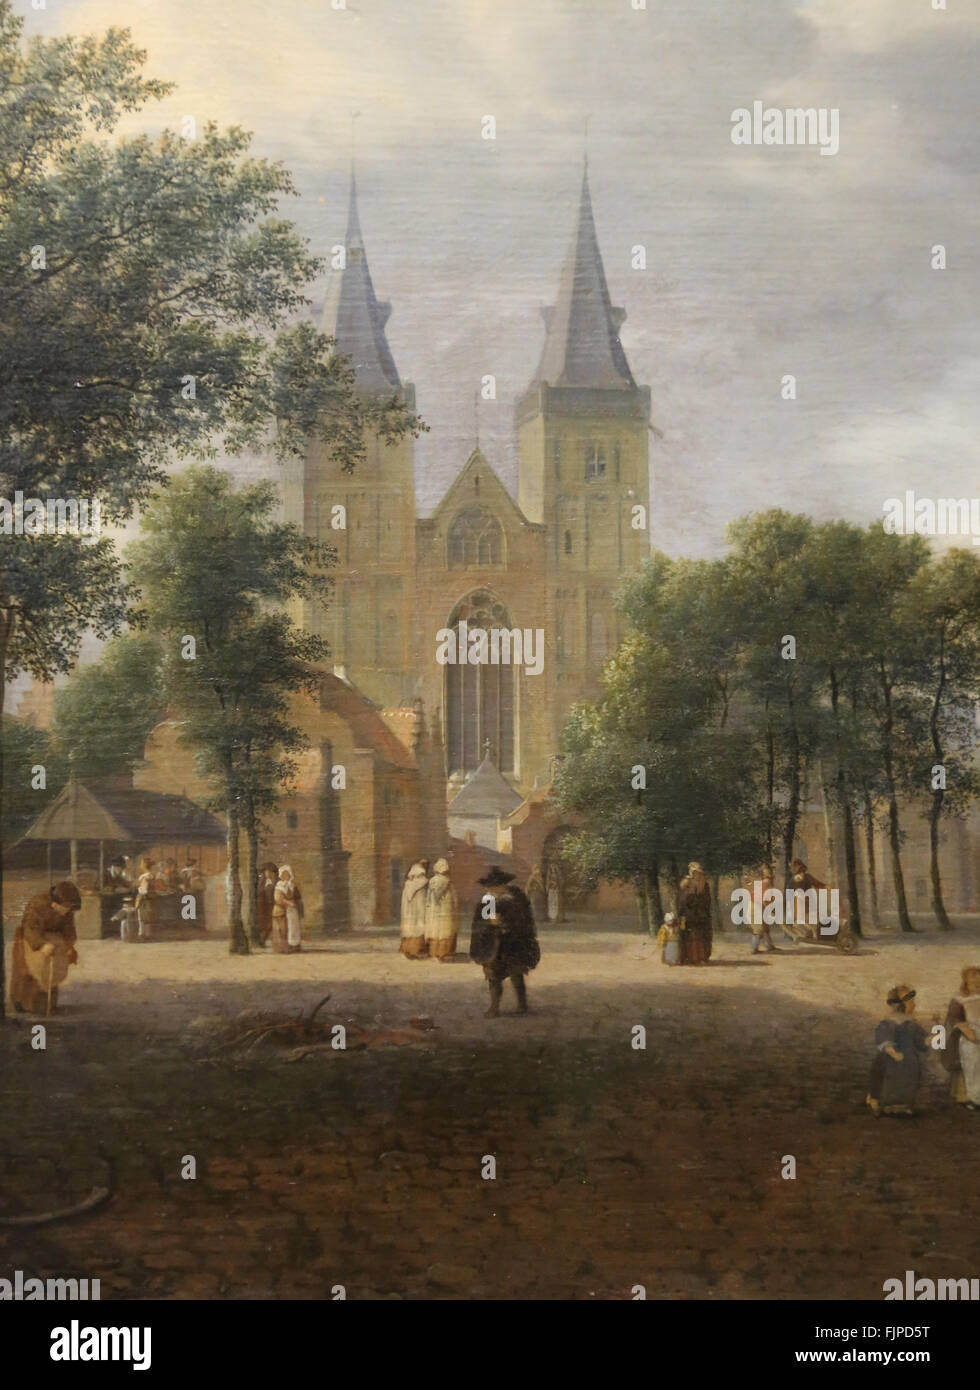 Jan van der Heyden (1637-1712). Dutch painter. Square and St Victor church, Xanten, Germany. 1692. Louvre Museum. - Stock Image